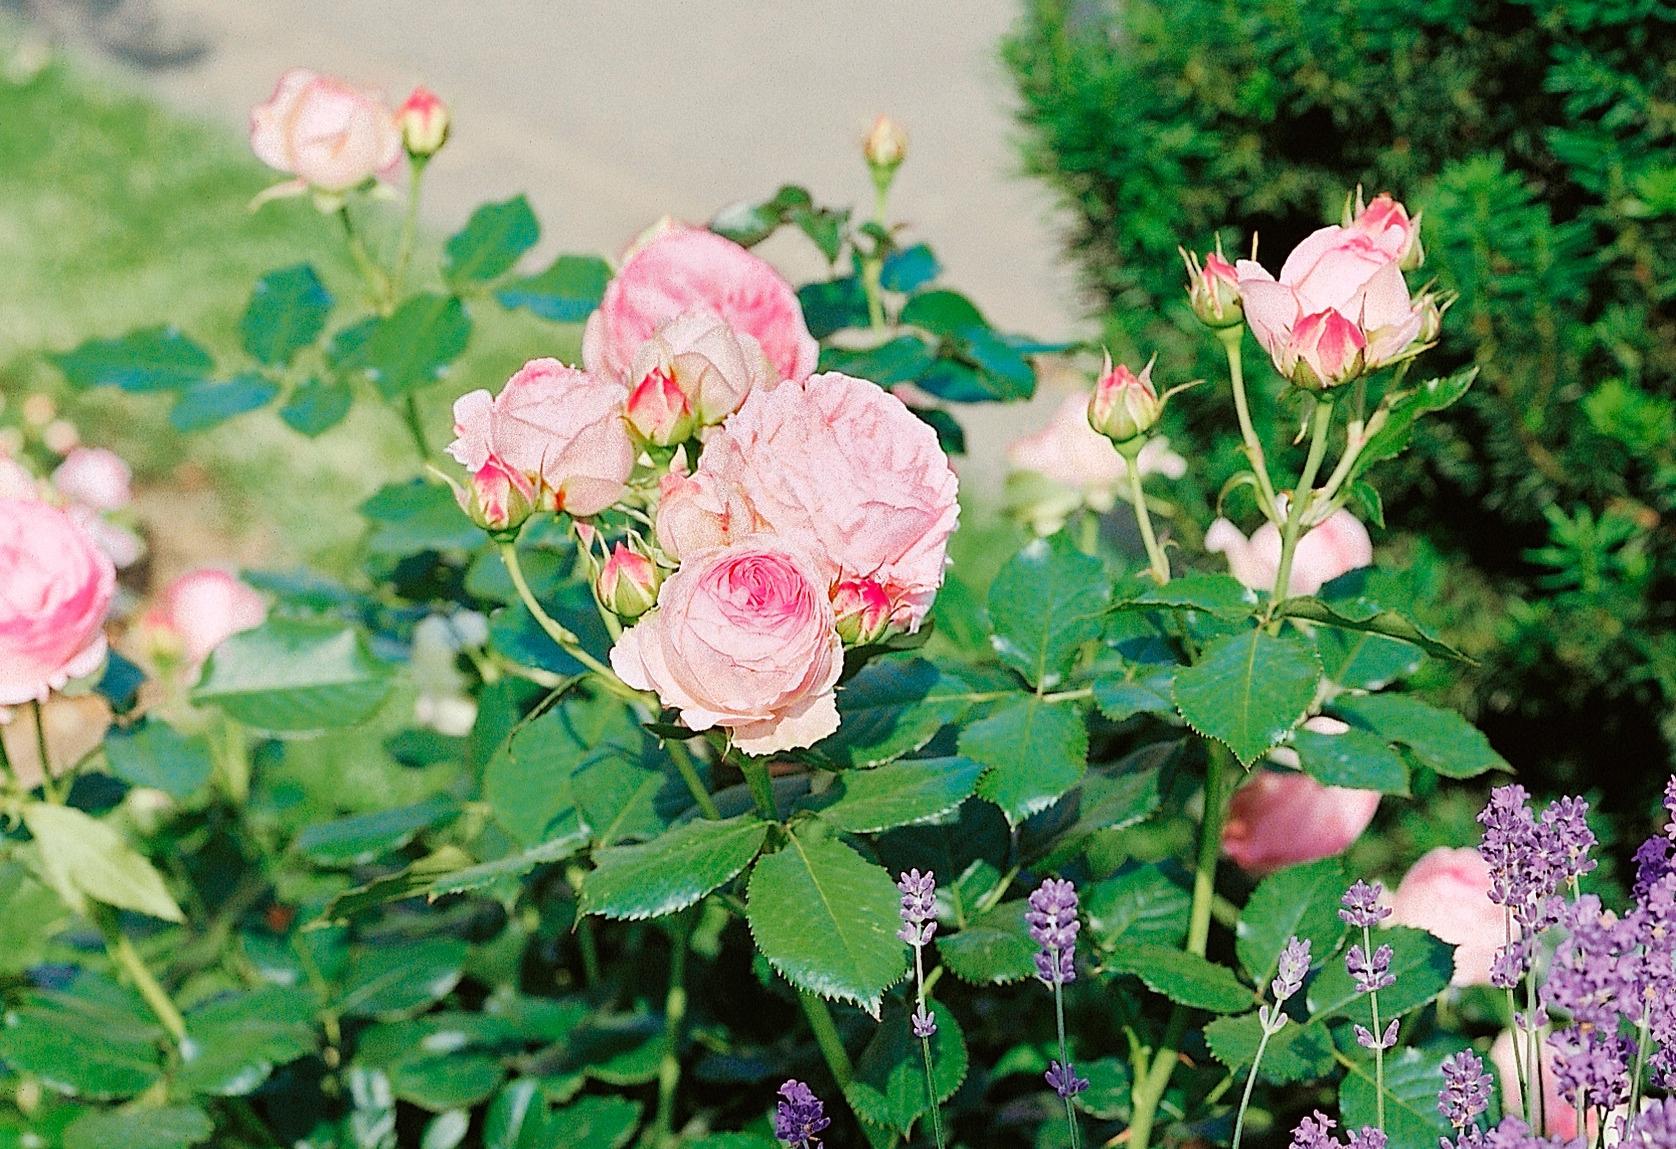 BCM Beetpflanze Strauchrose Eden Rose rosa Beetpflanzen Pflanzen Garten Balkon